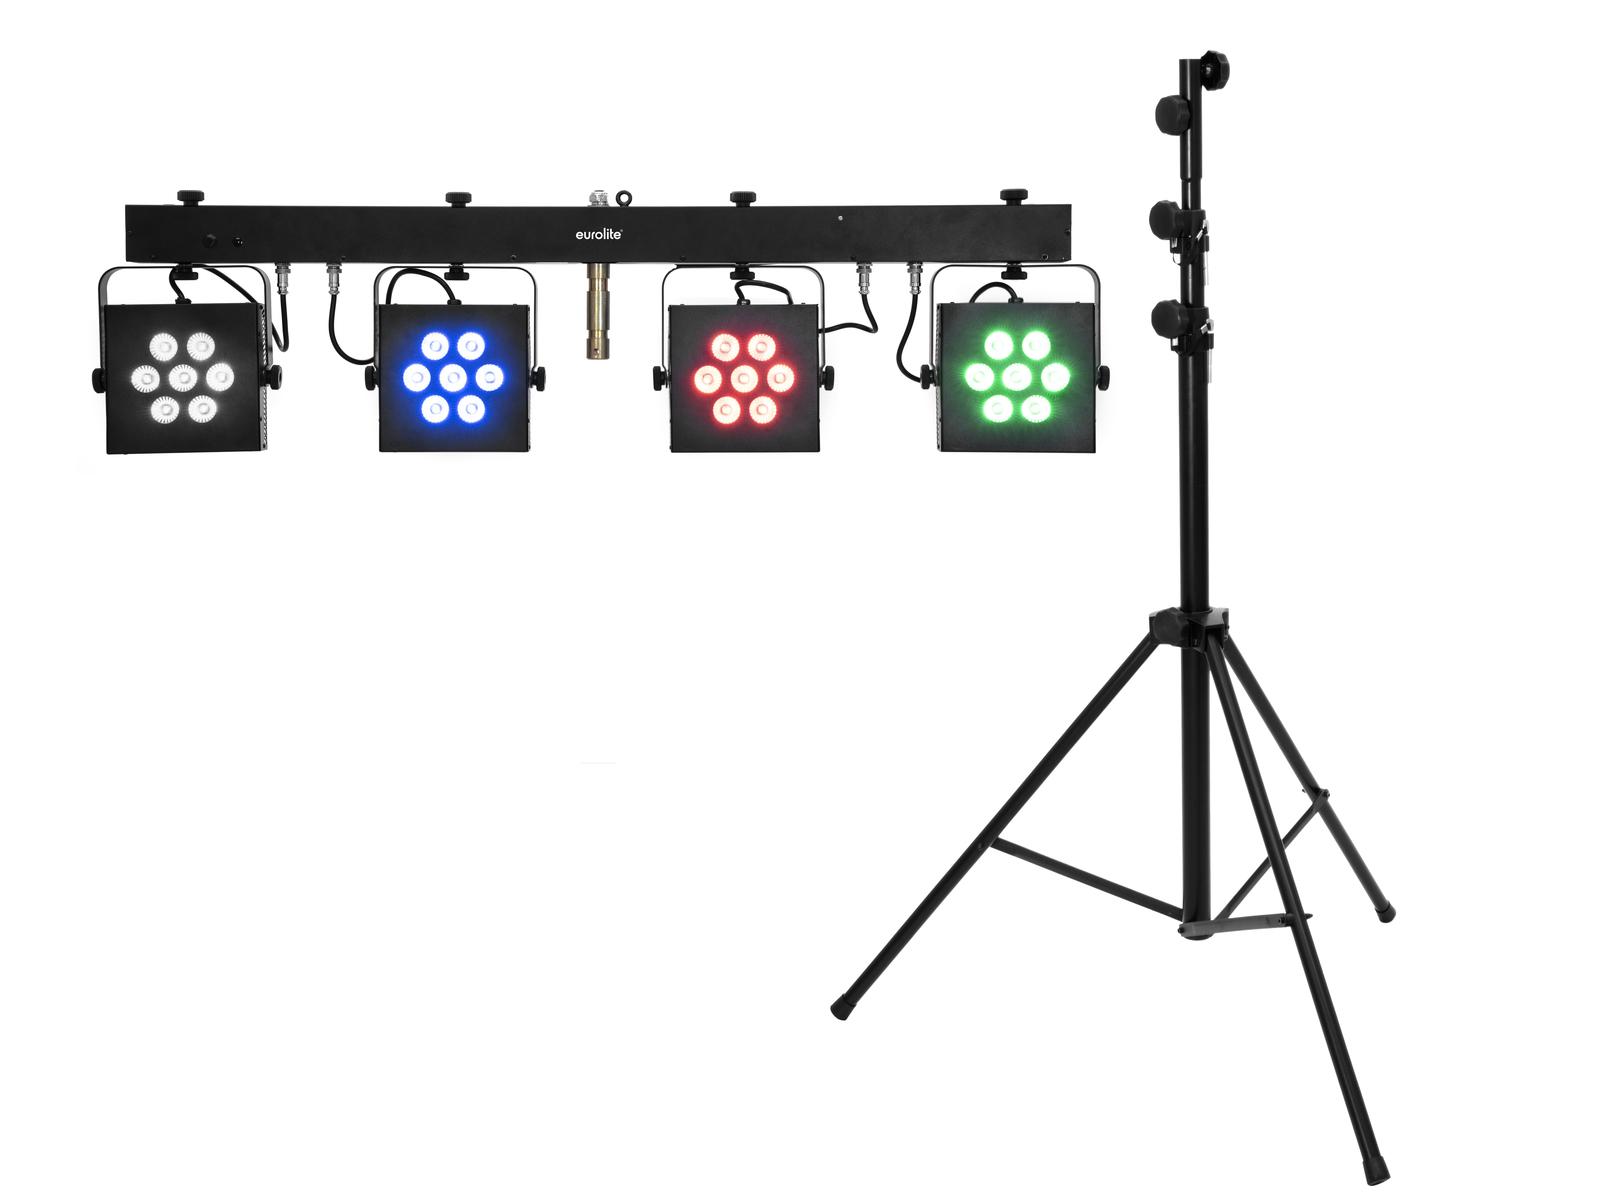 EUROLITE Set LED KLS-3002 + STV-60-WOT EU Stahlstativ schwarz